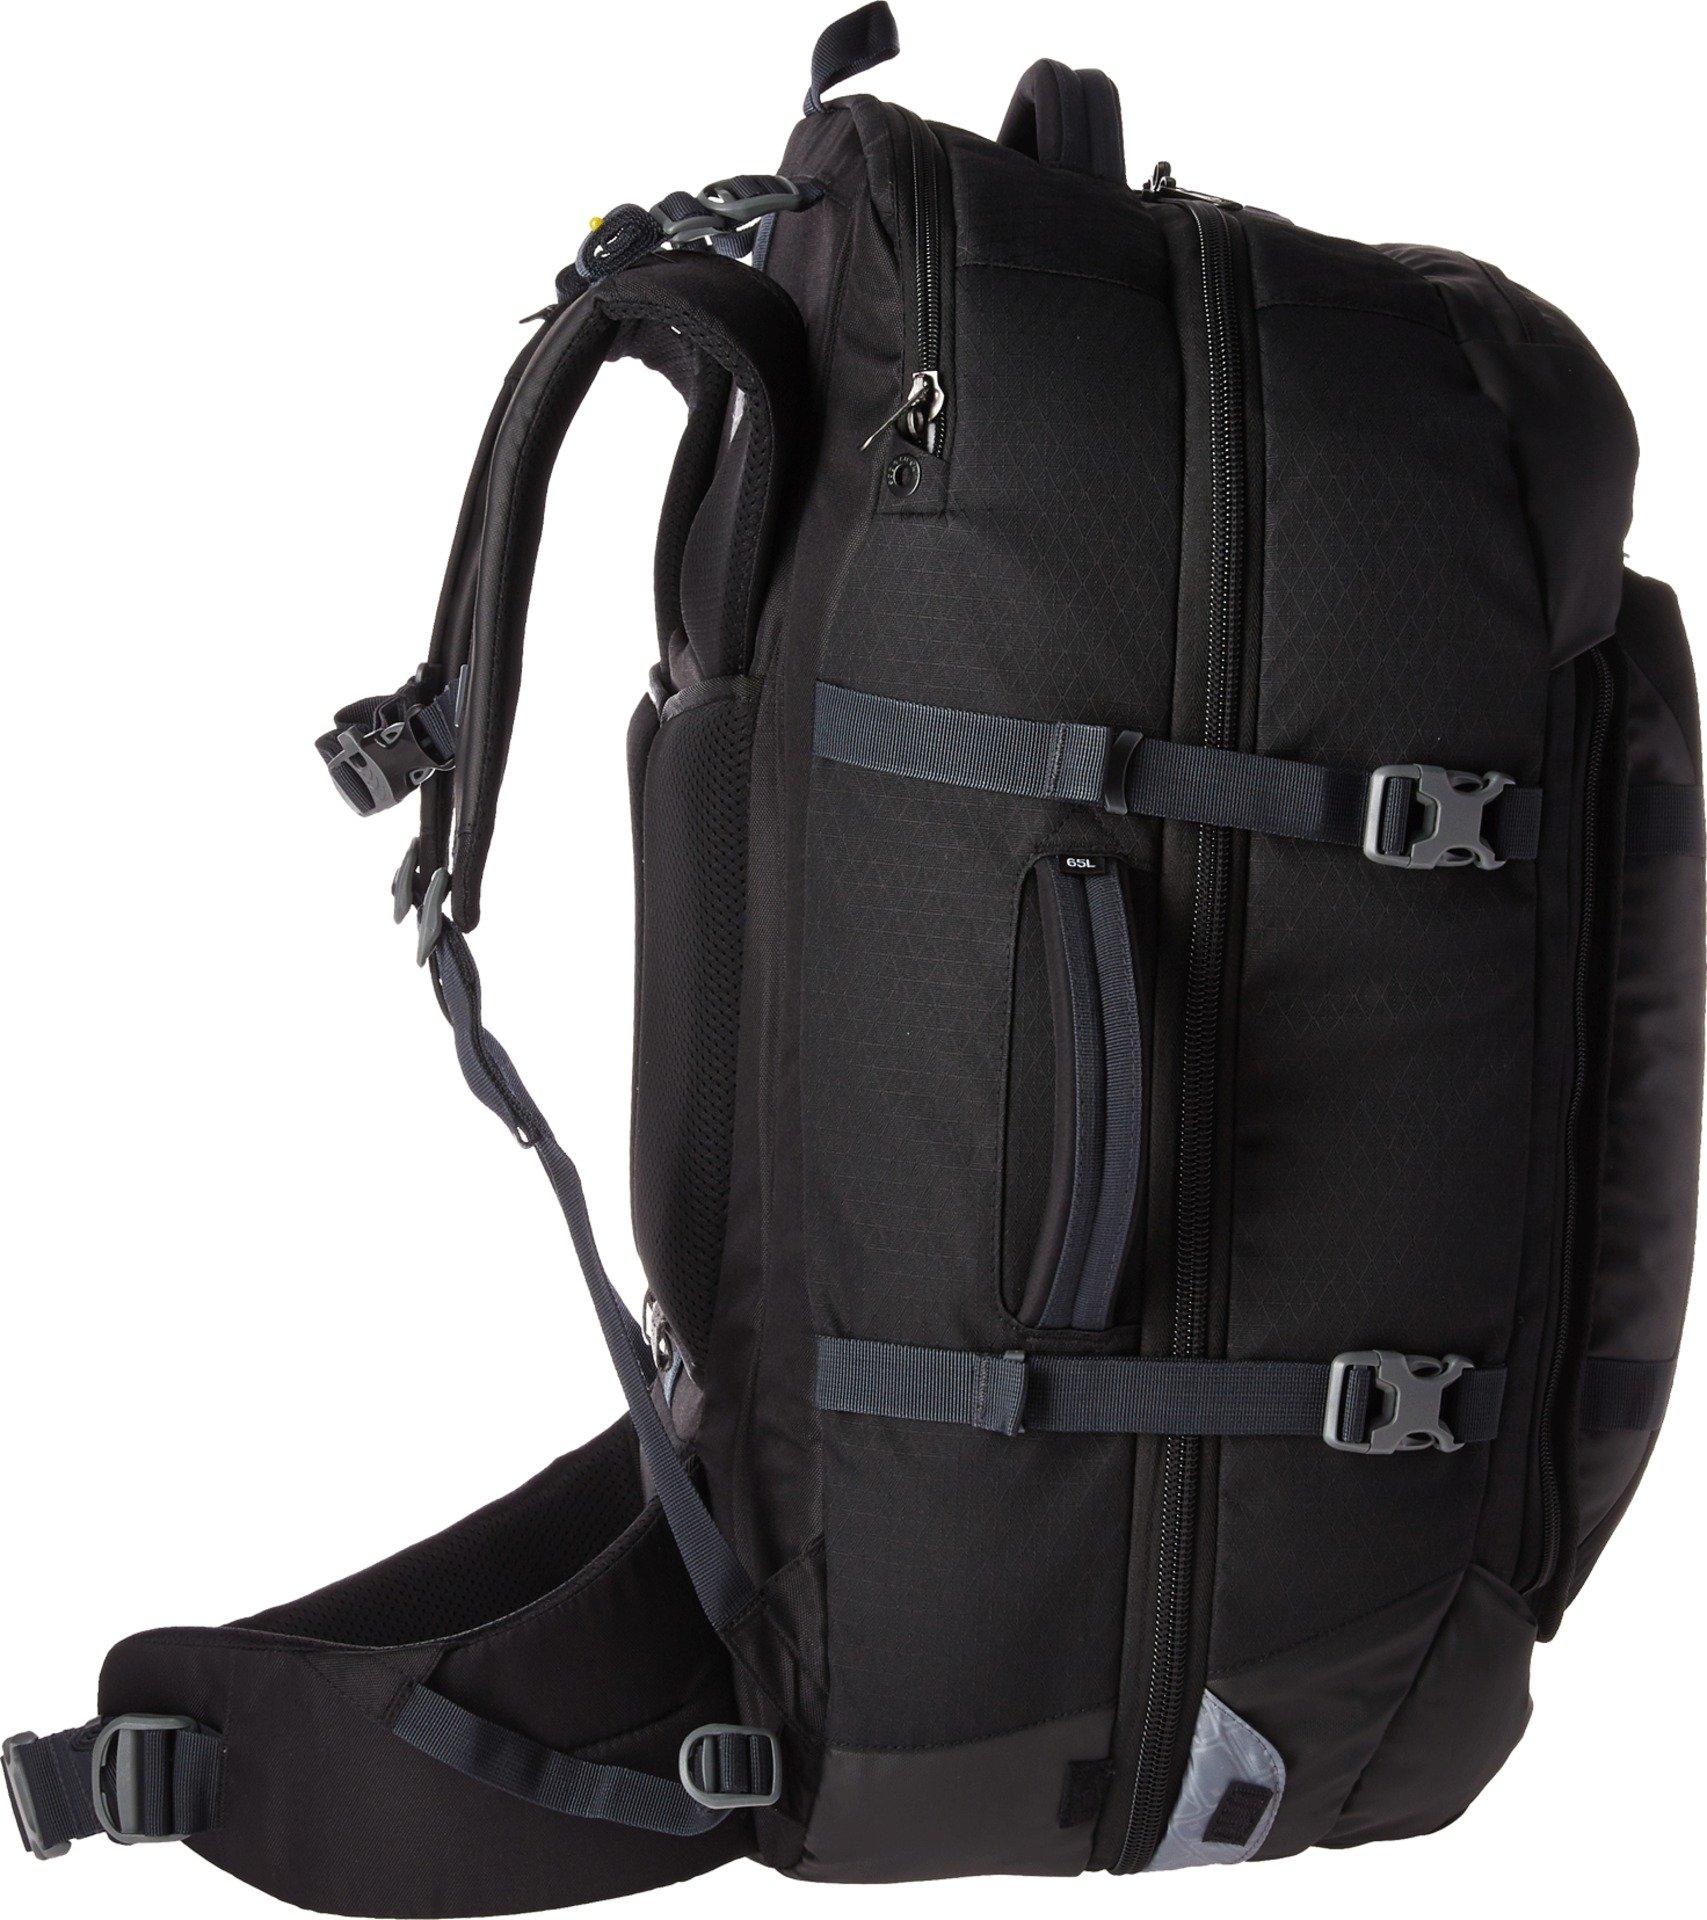 Eagle Creek Unisex Global Companion Travel Packs 65L Black One Size by Eagle Creek (Image #3)